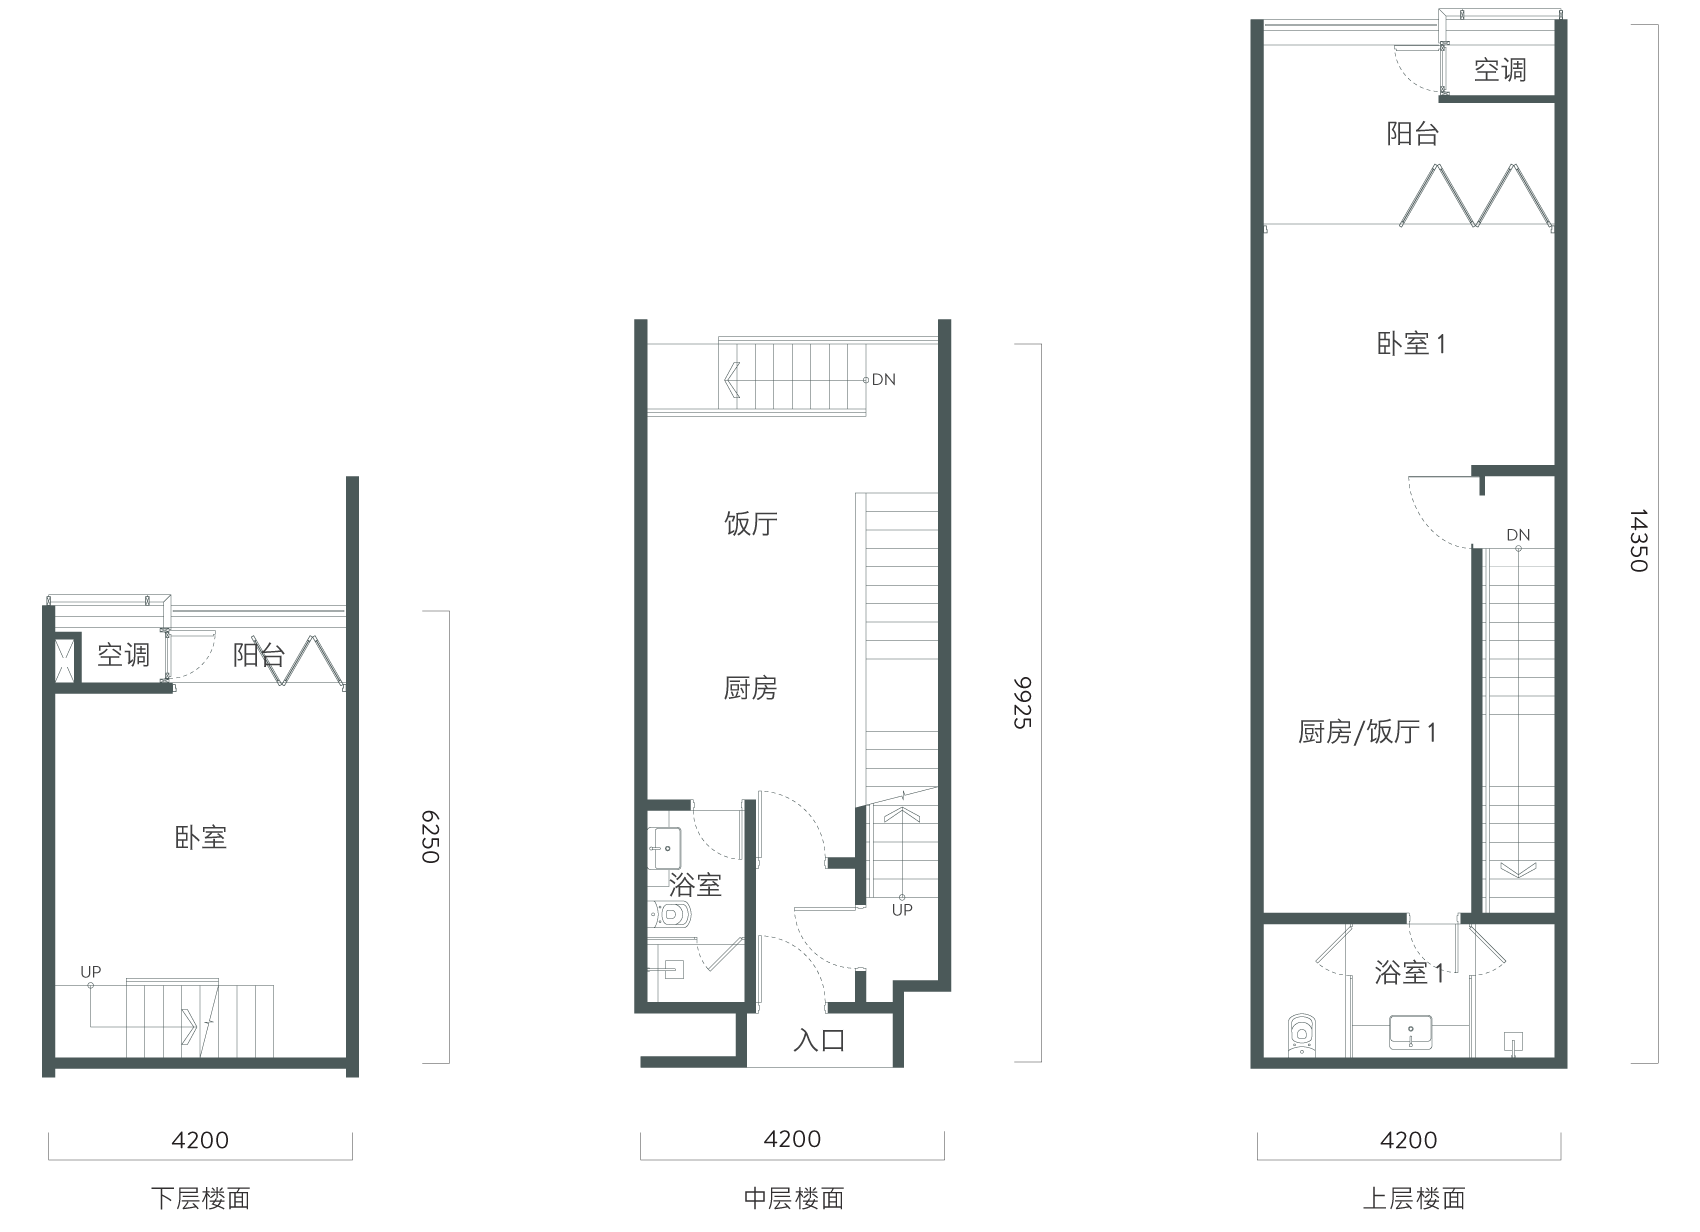 TS3c Floorplan